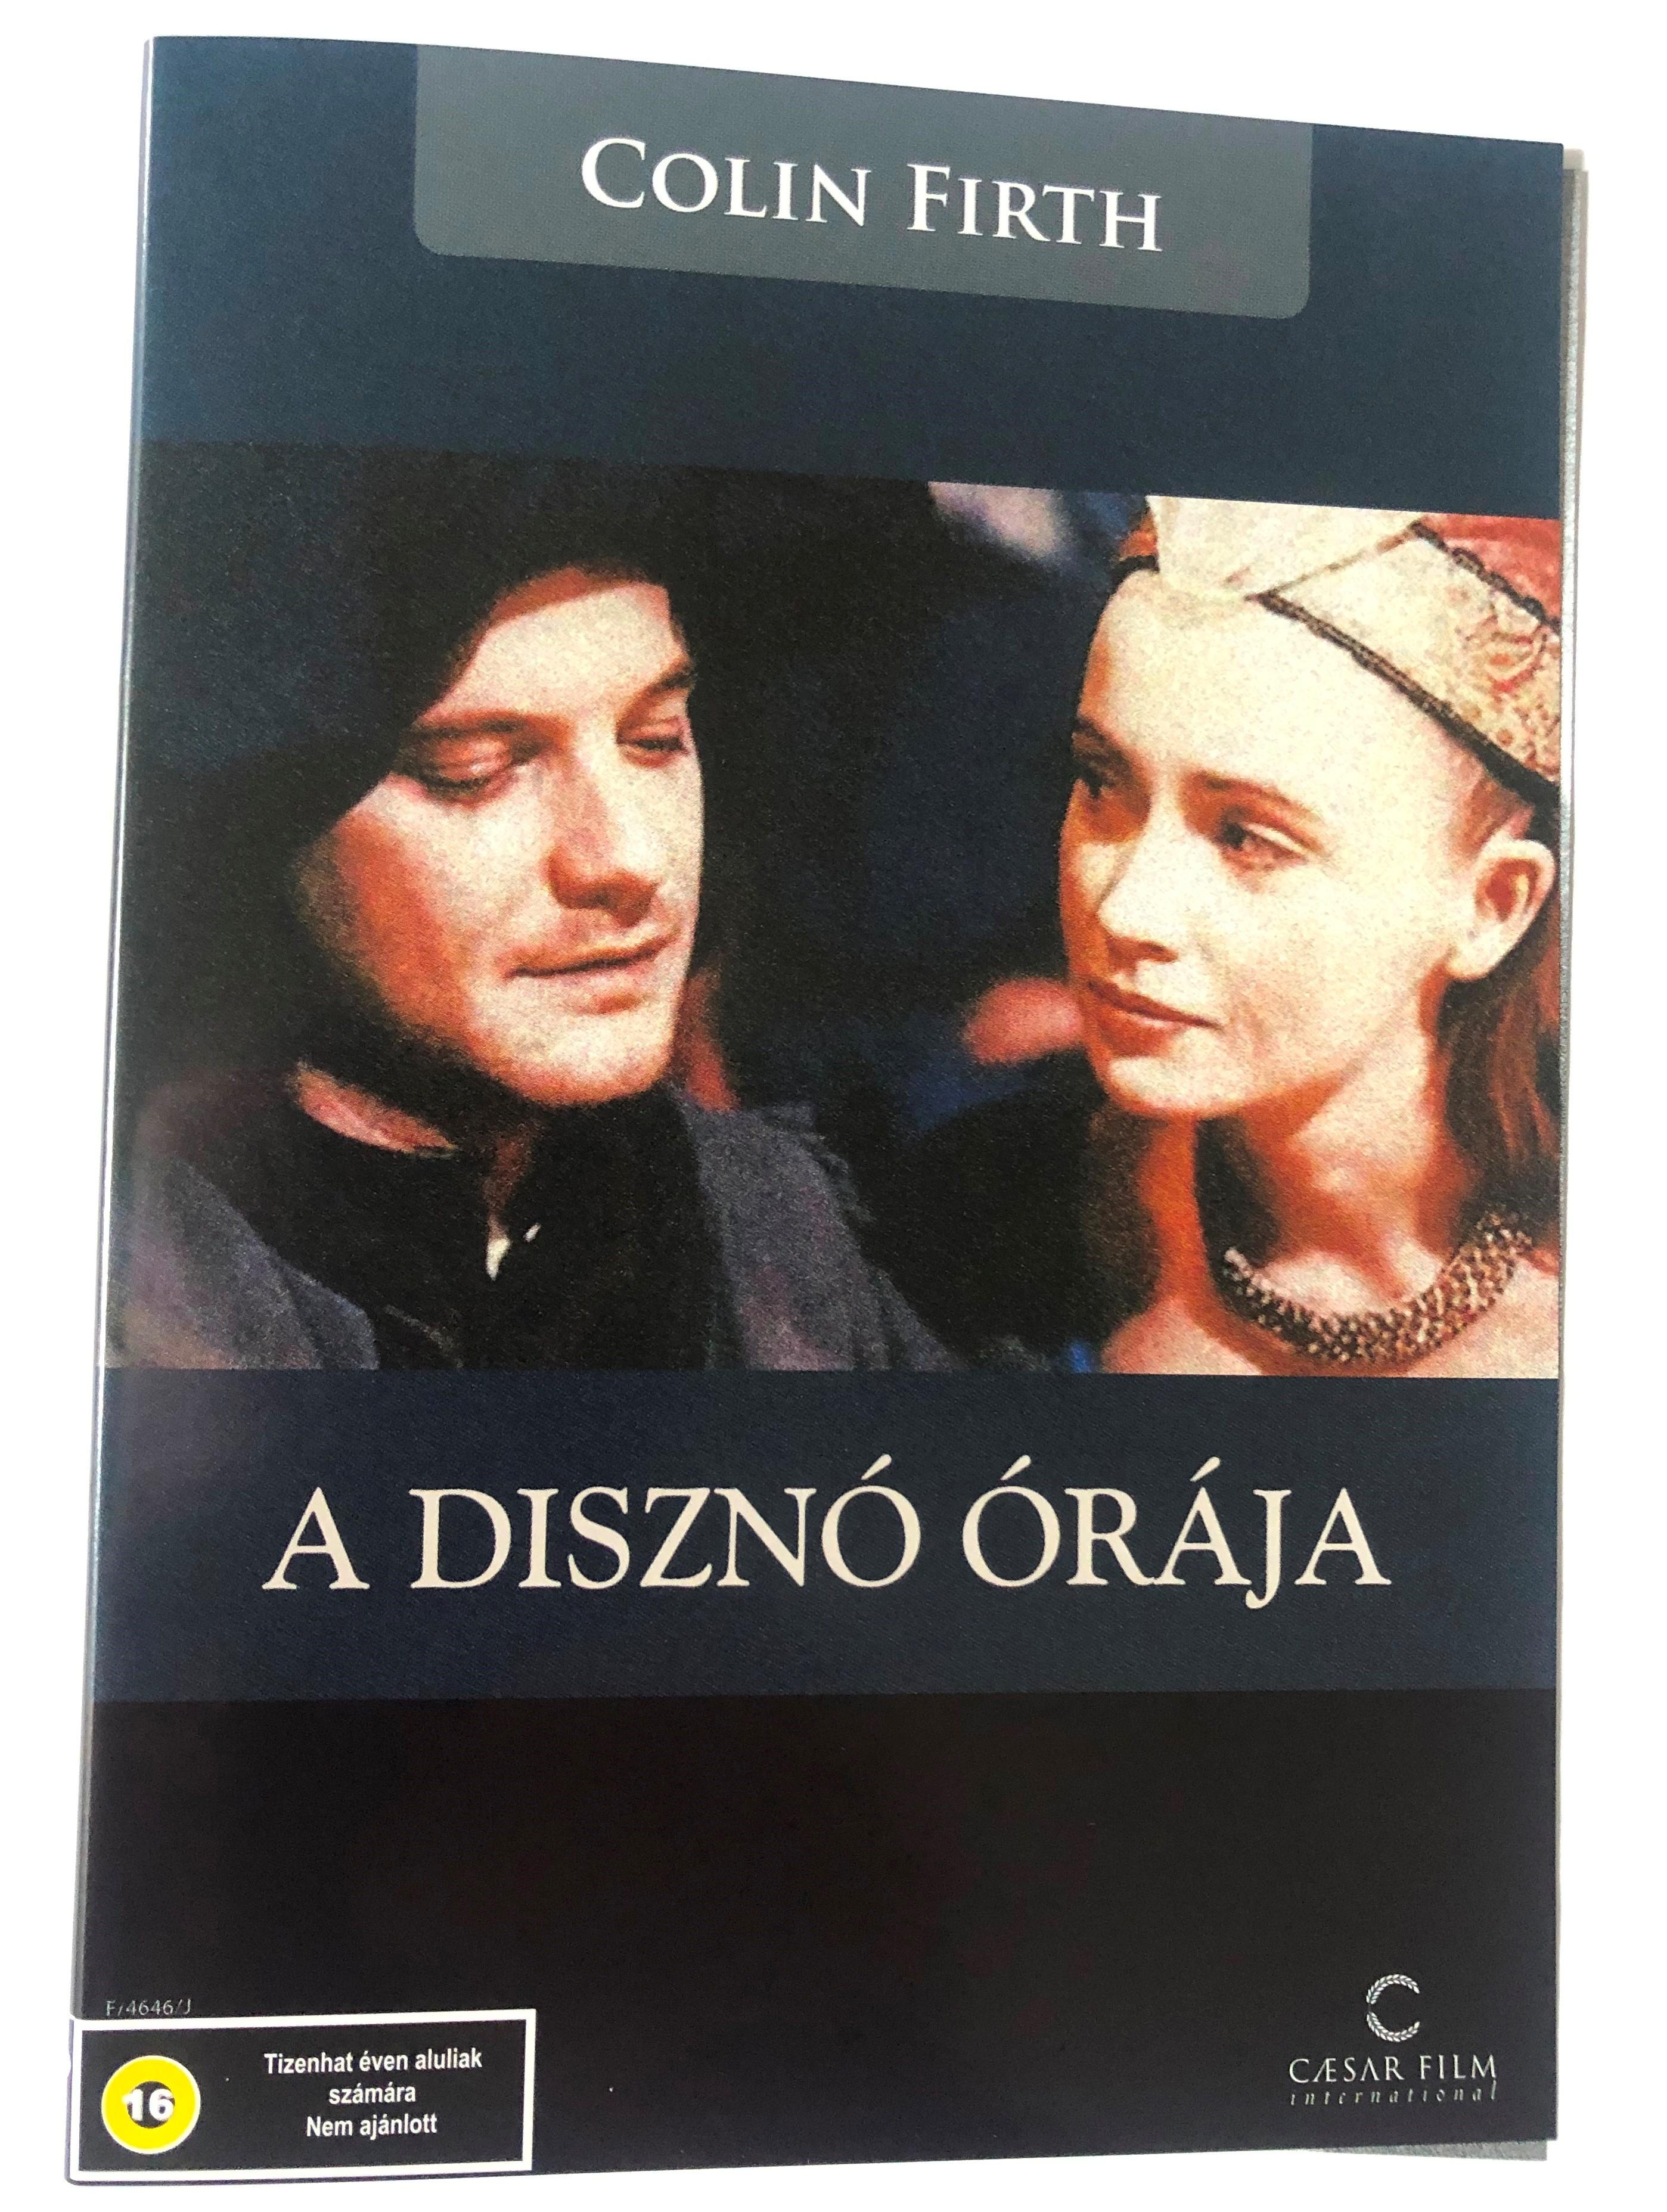 Disznó órája - DVD